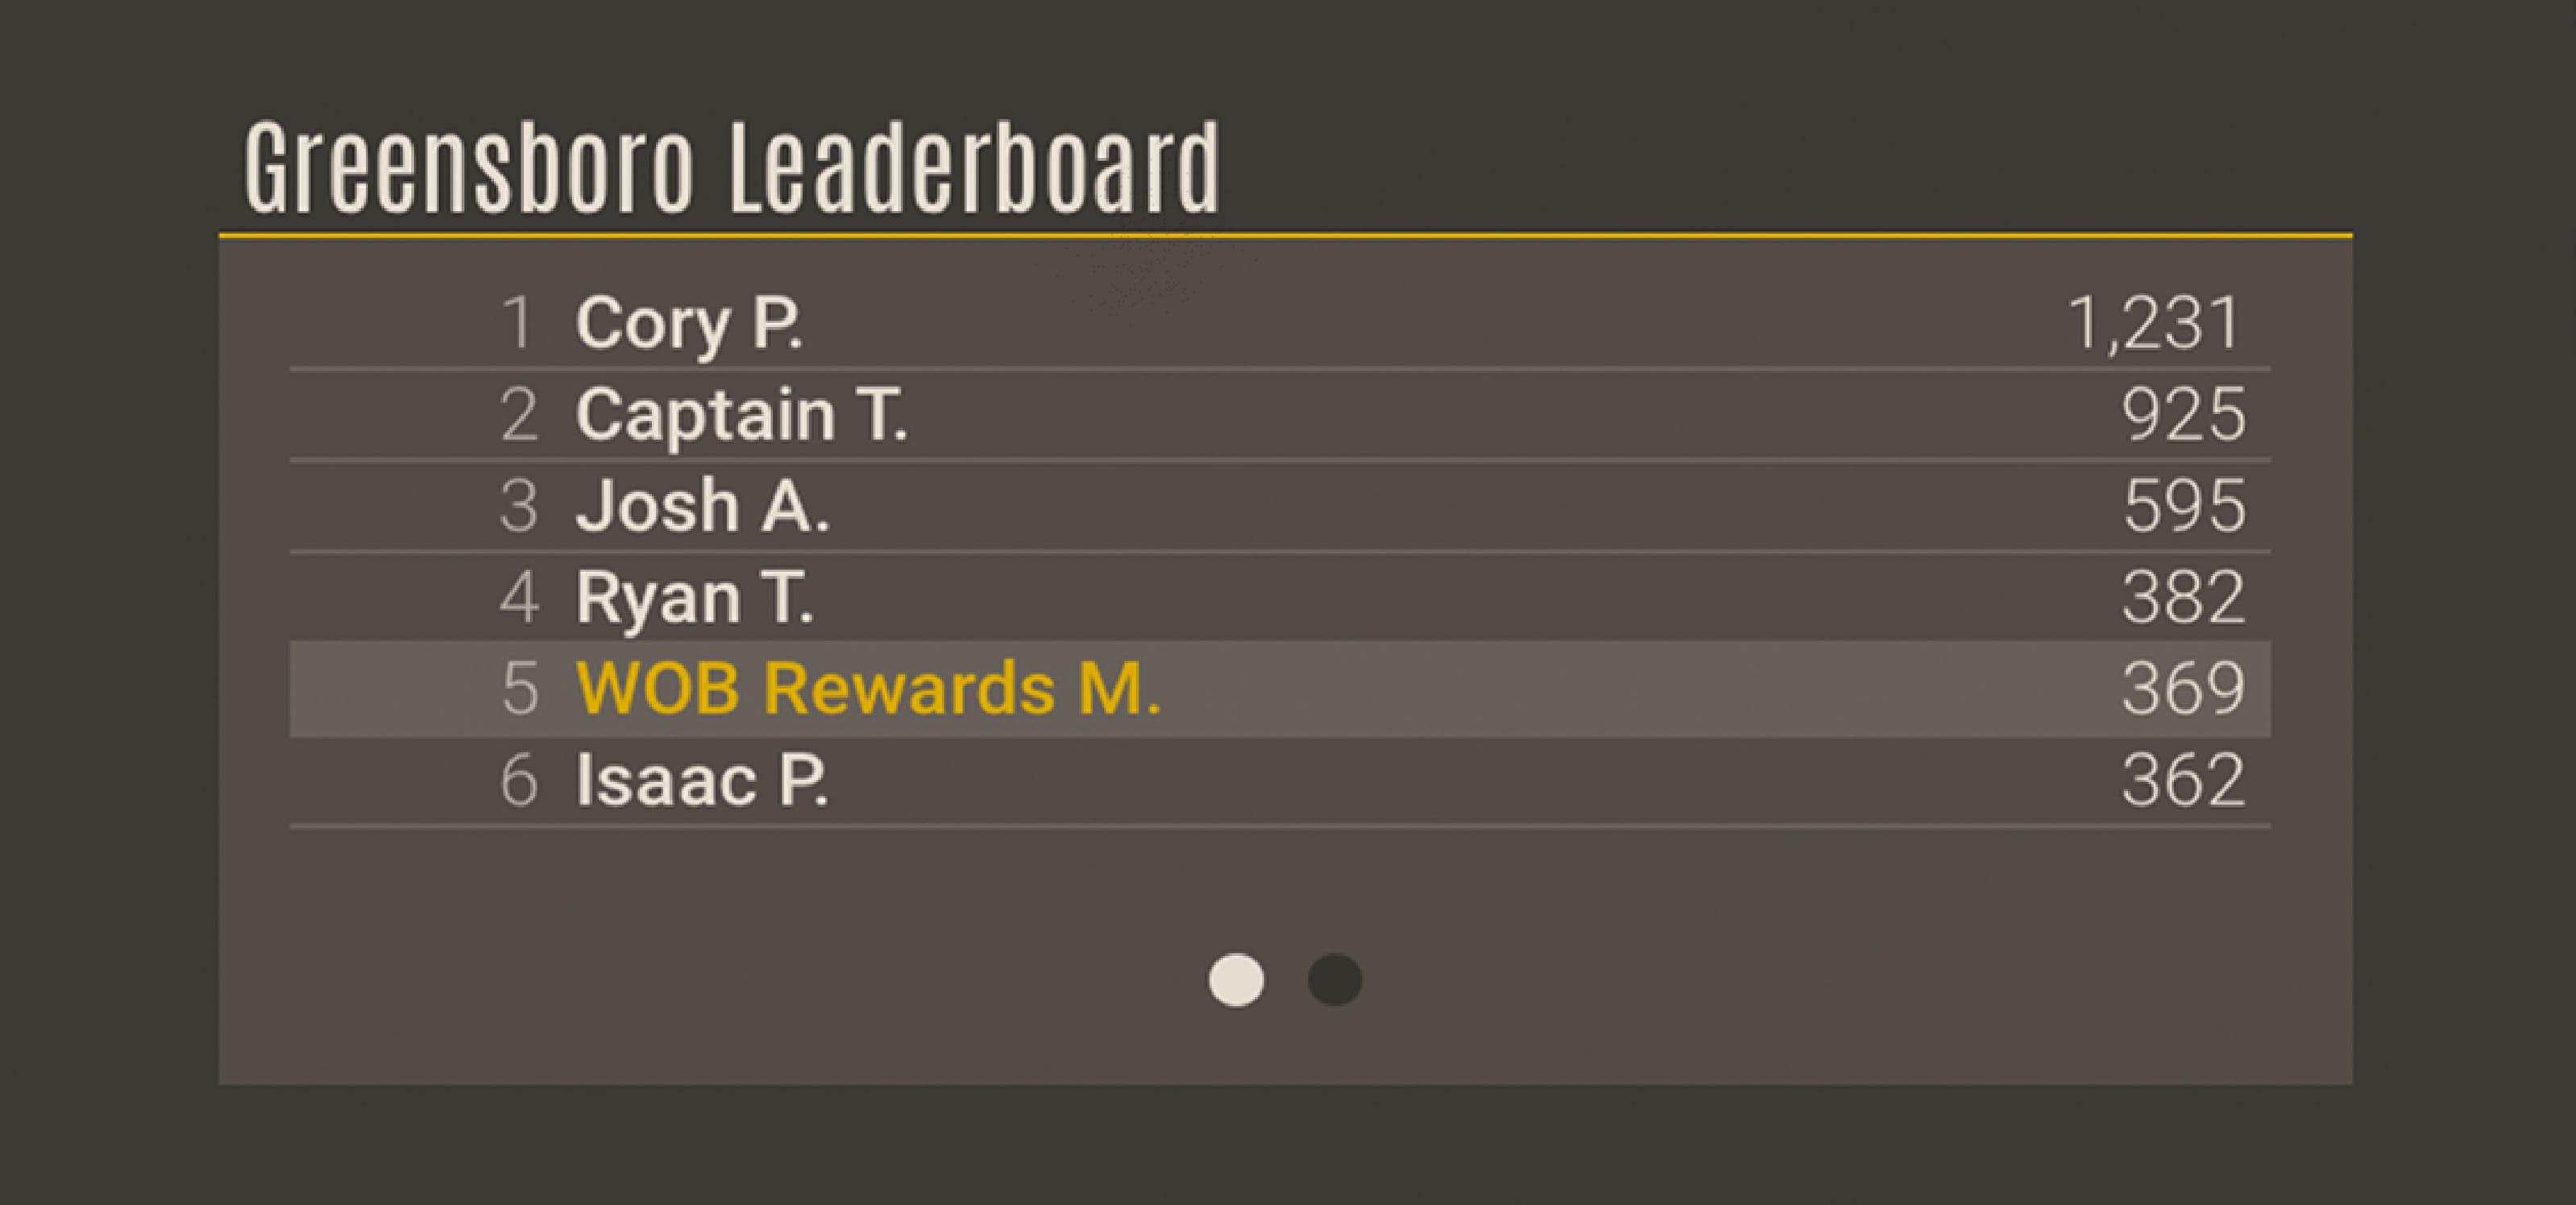 WOB Rewards Greensboro leaderboard screenshot